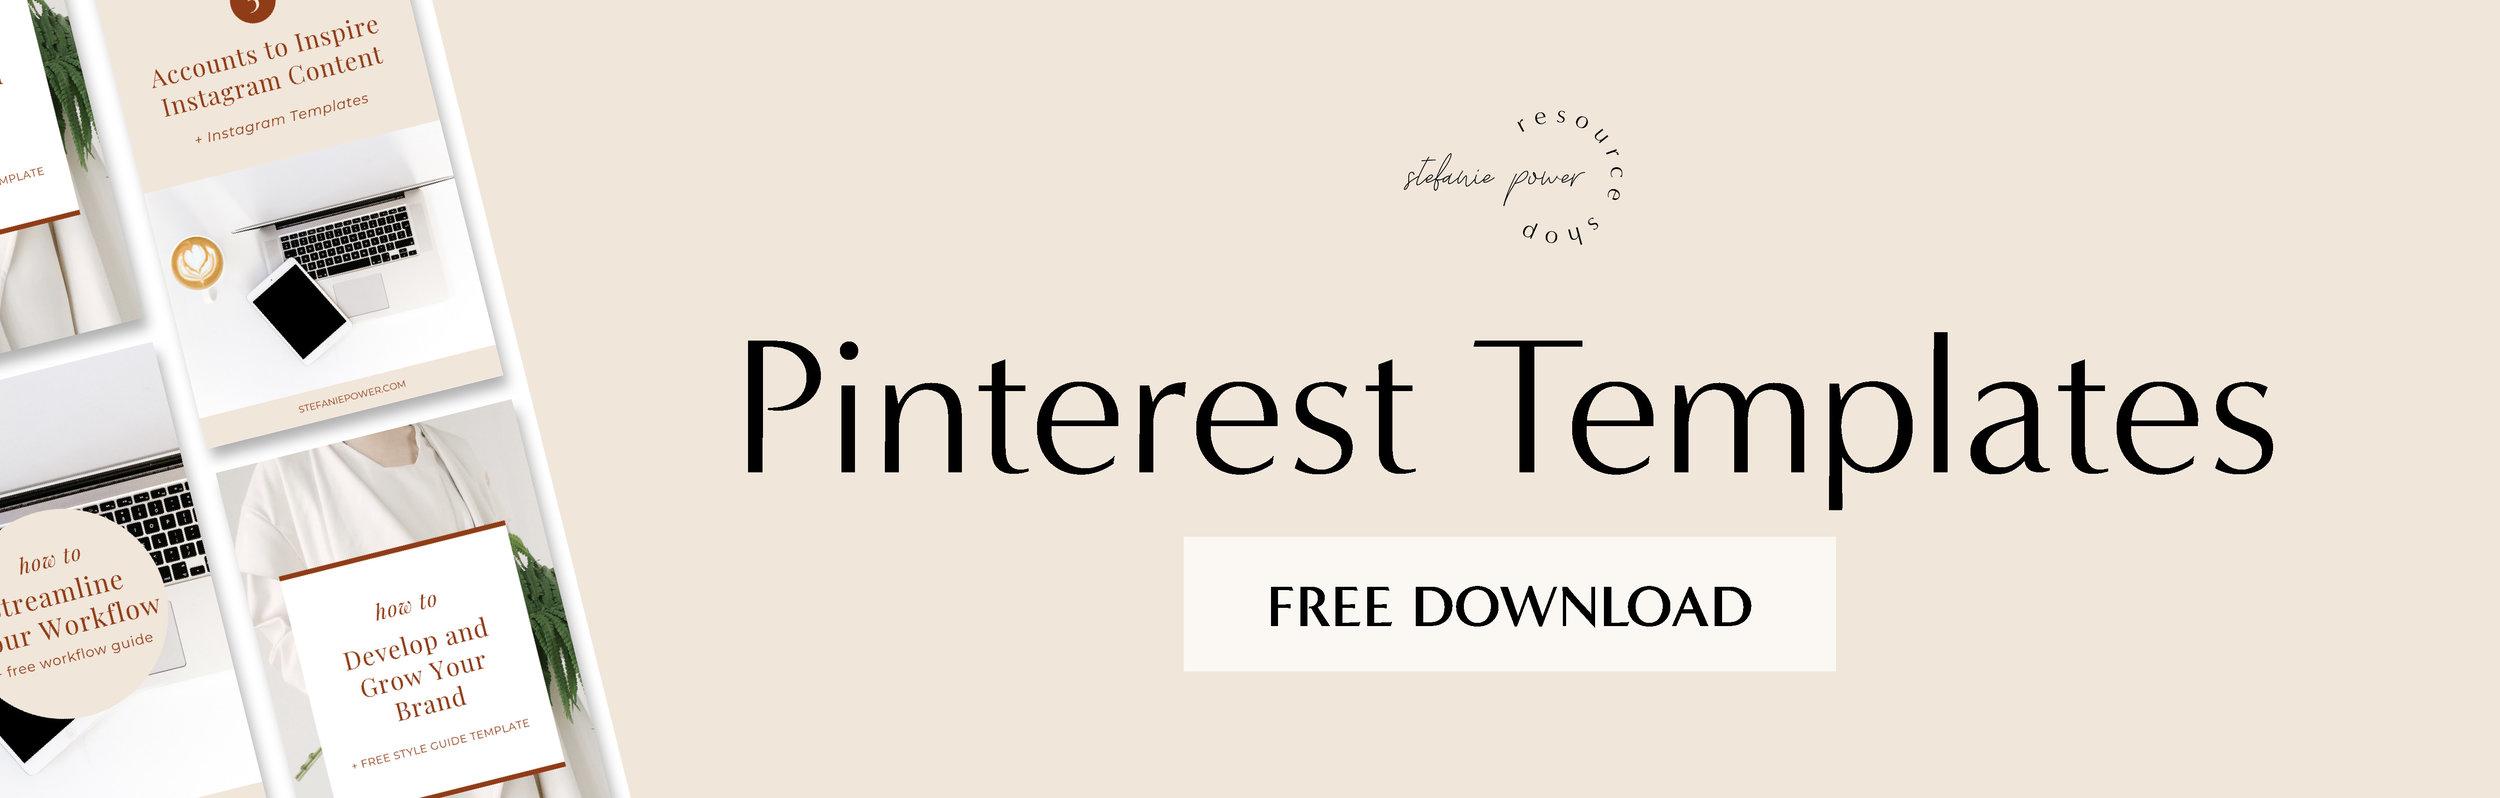 pinterest-templates-free